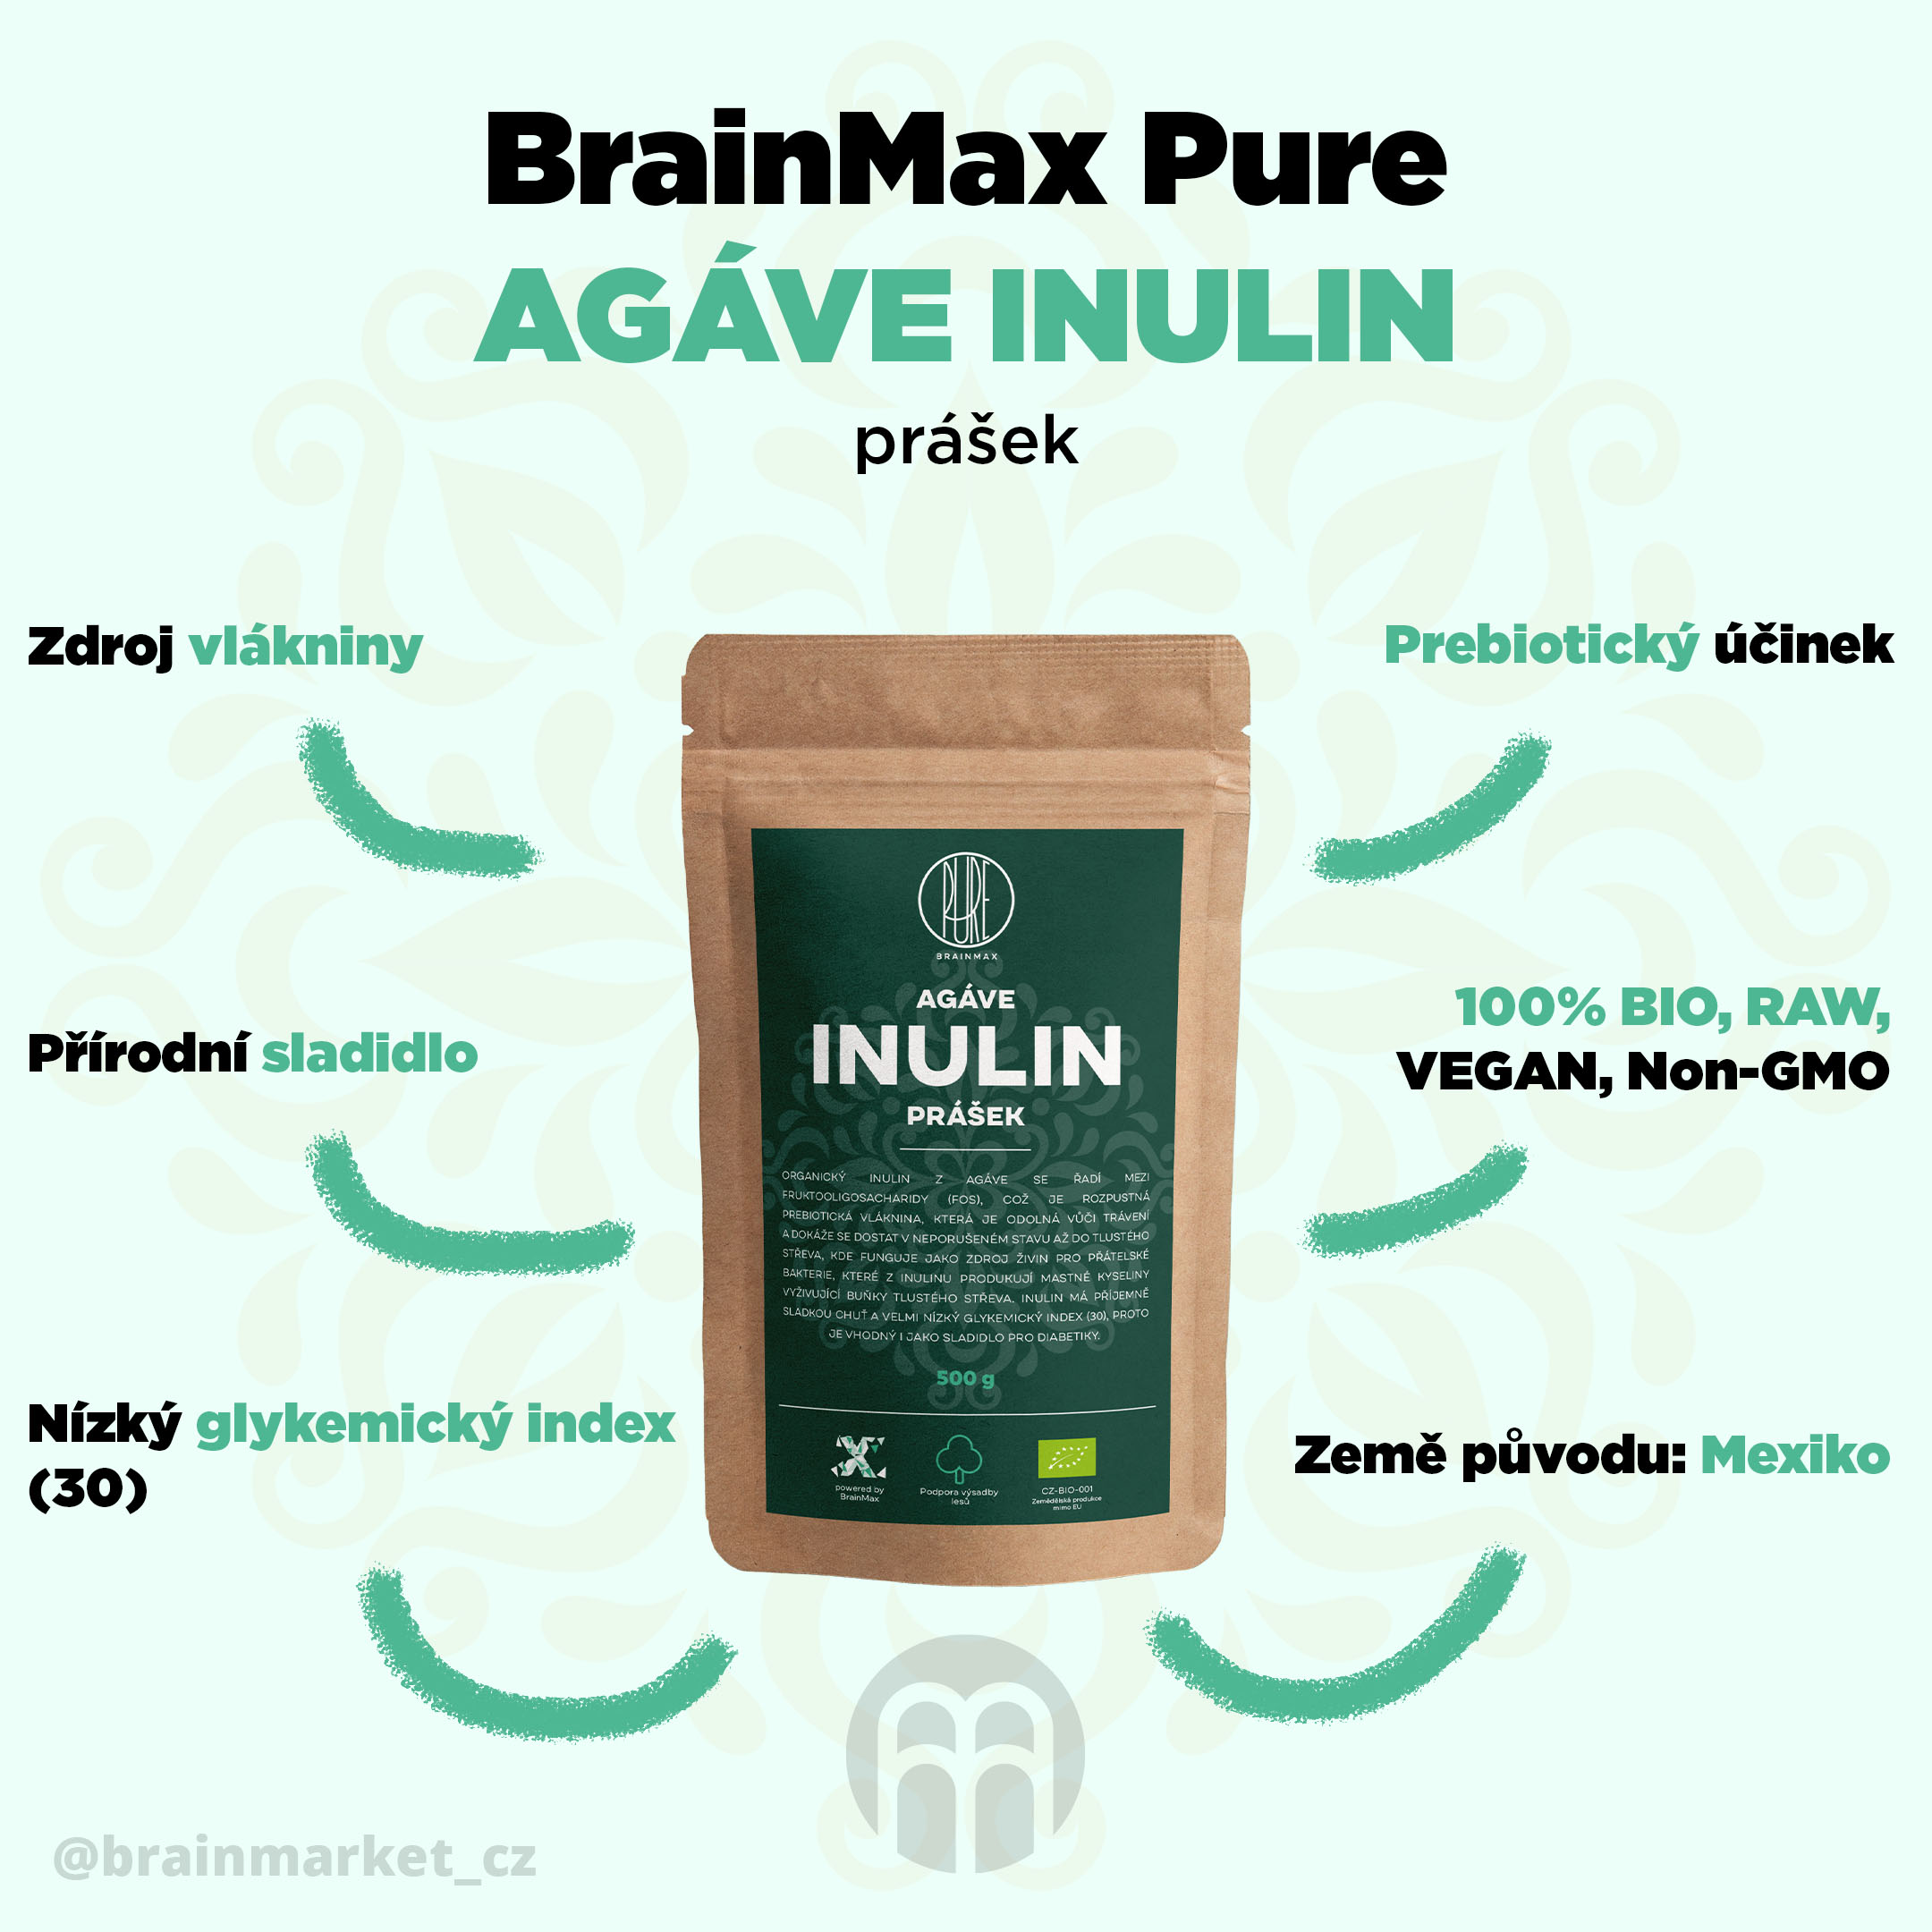 inulin-agave-brainmax-pure-infografika-brainmarket-cz